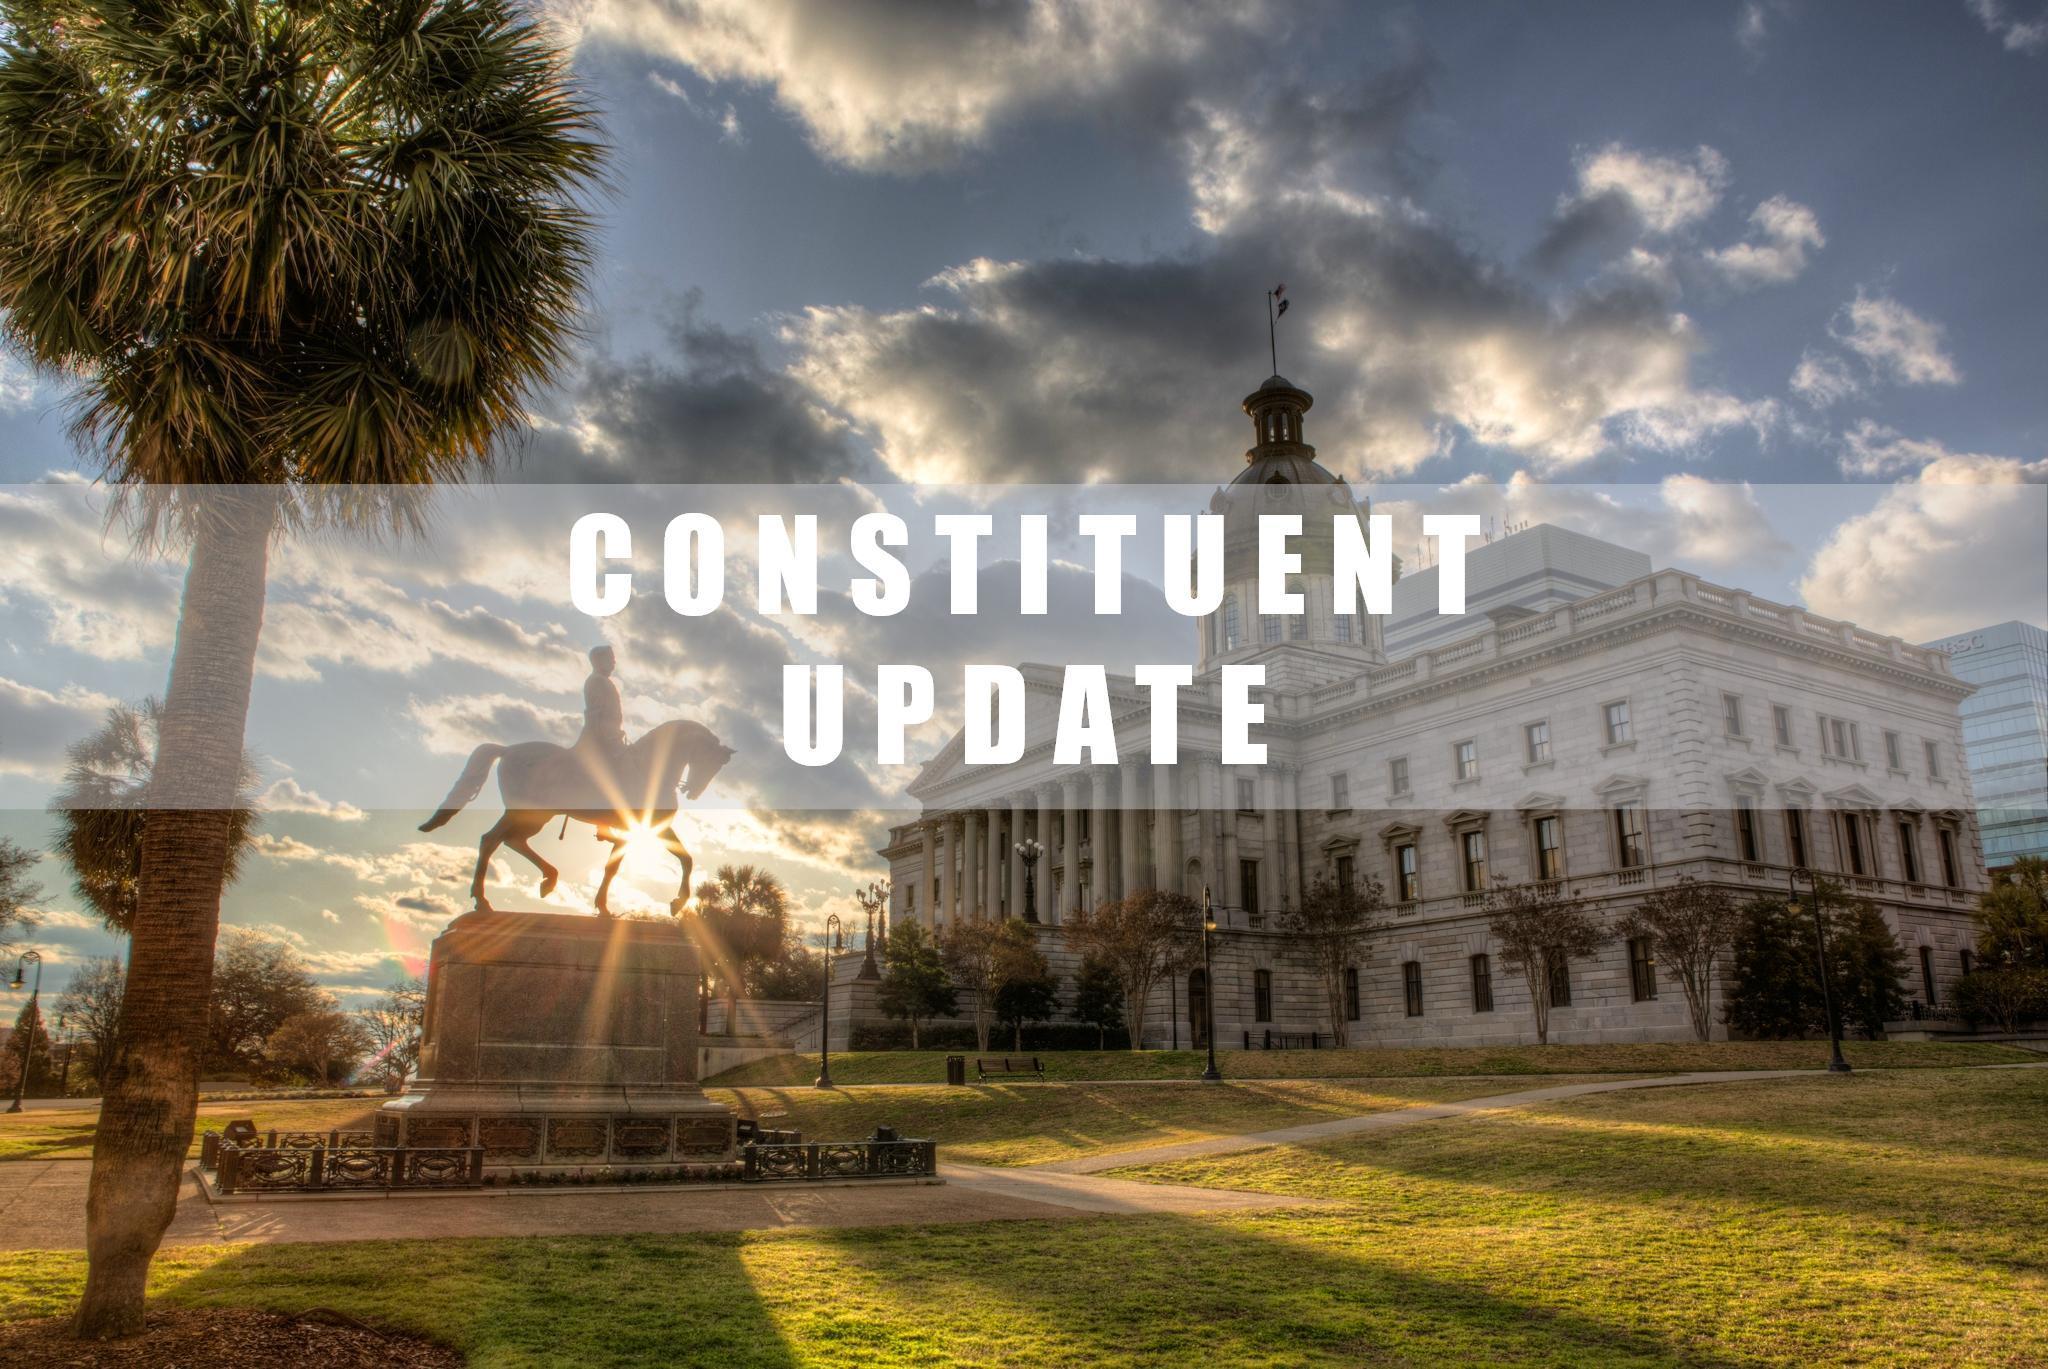 Constituent Update Thumbnail